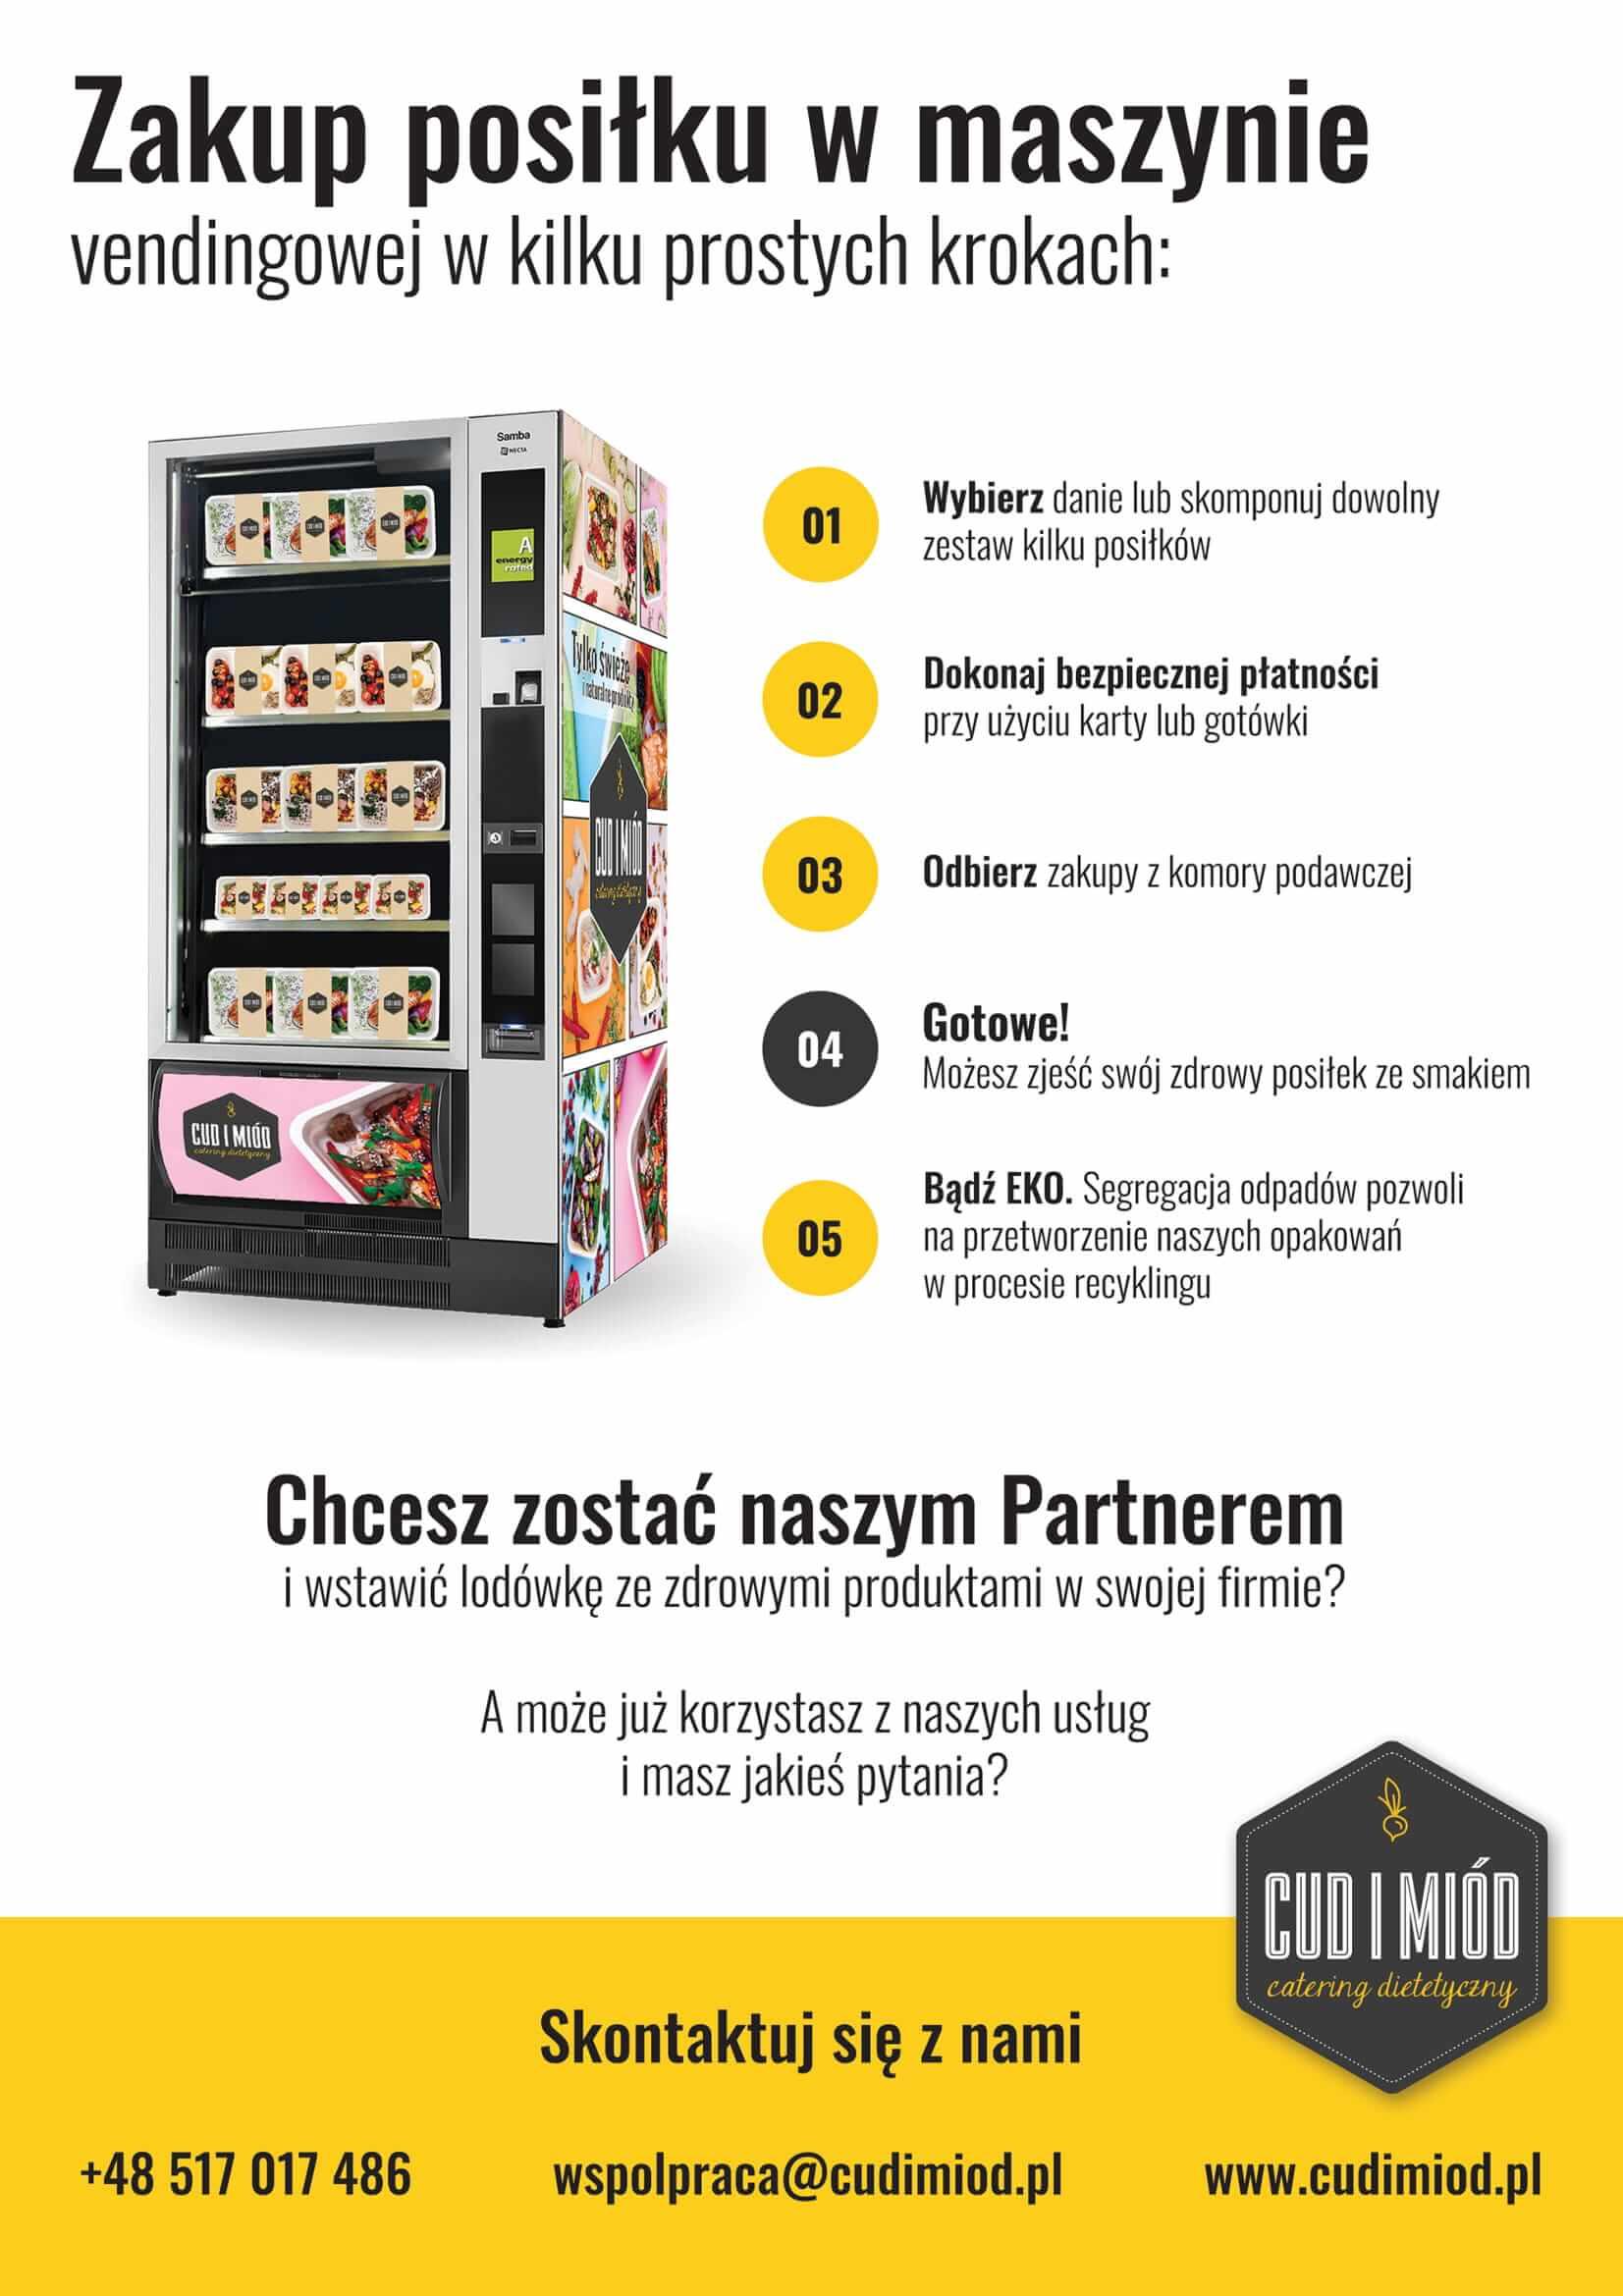 Maszyny vendingowa Cud i Miód